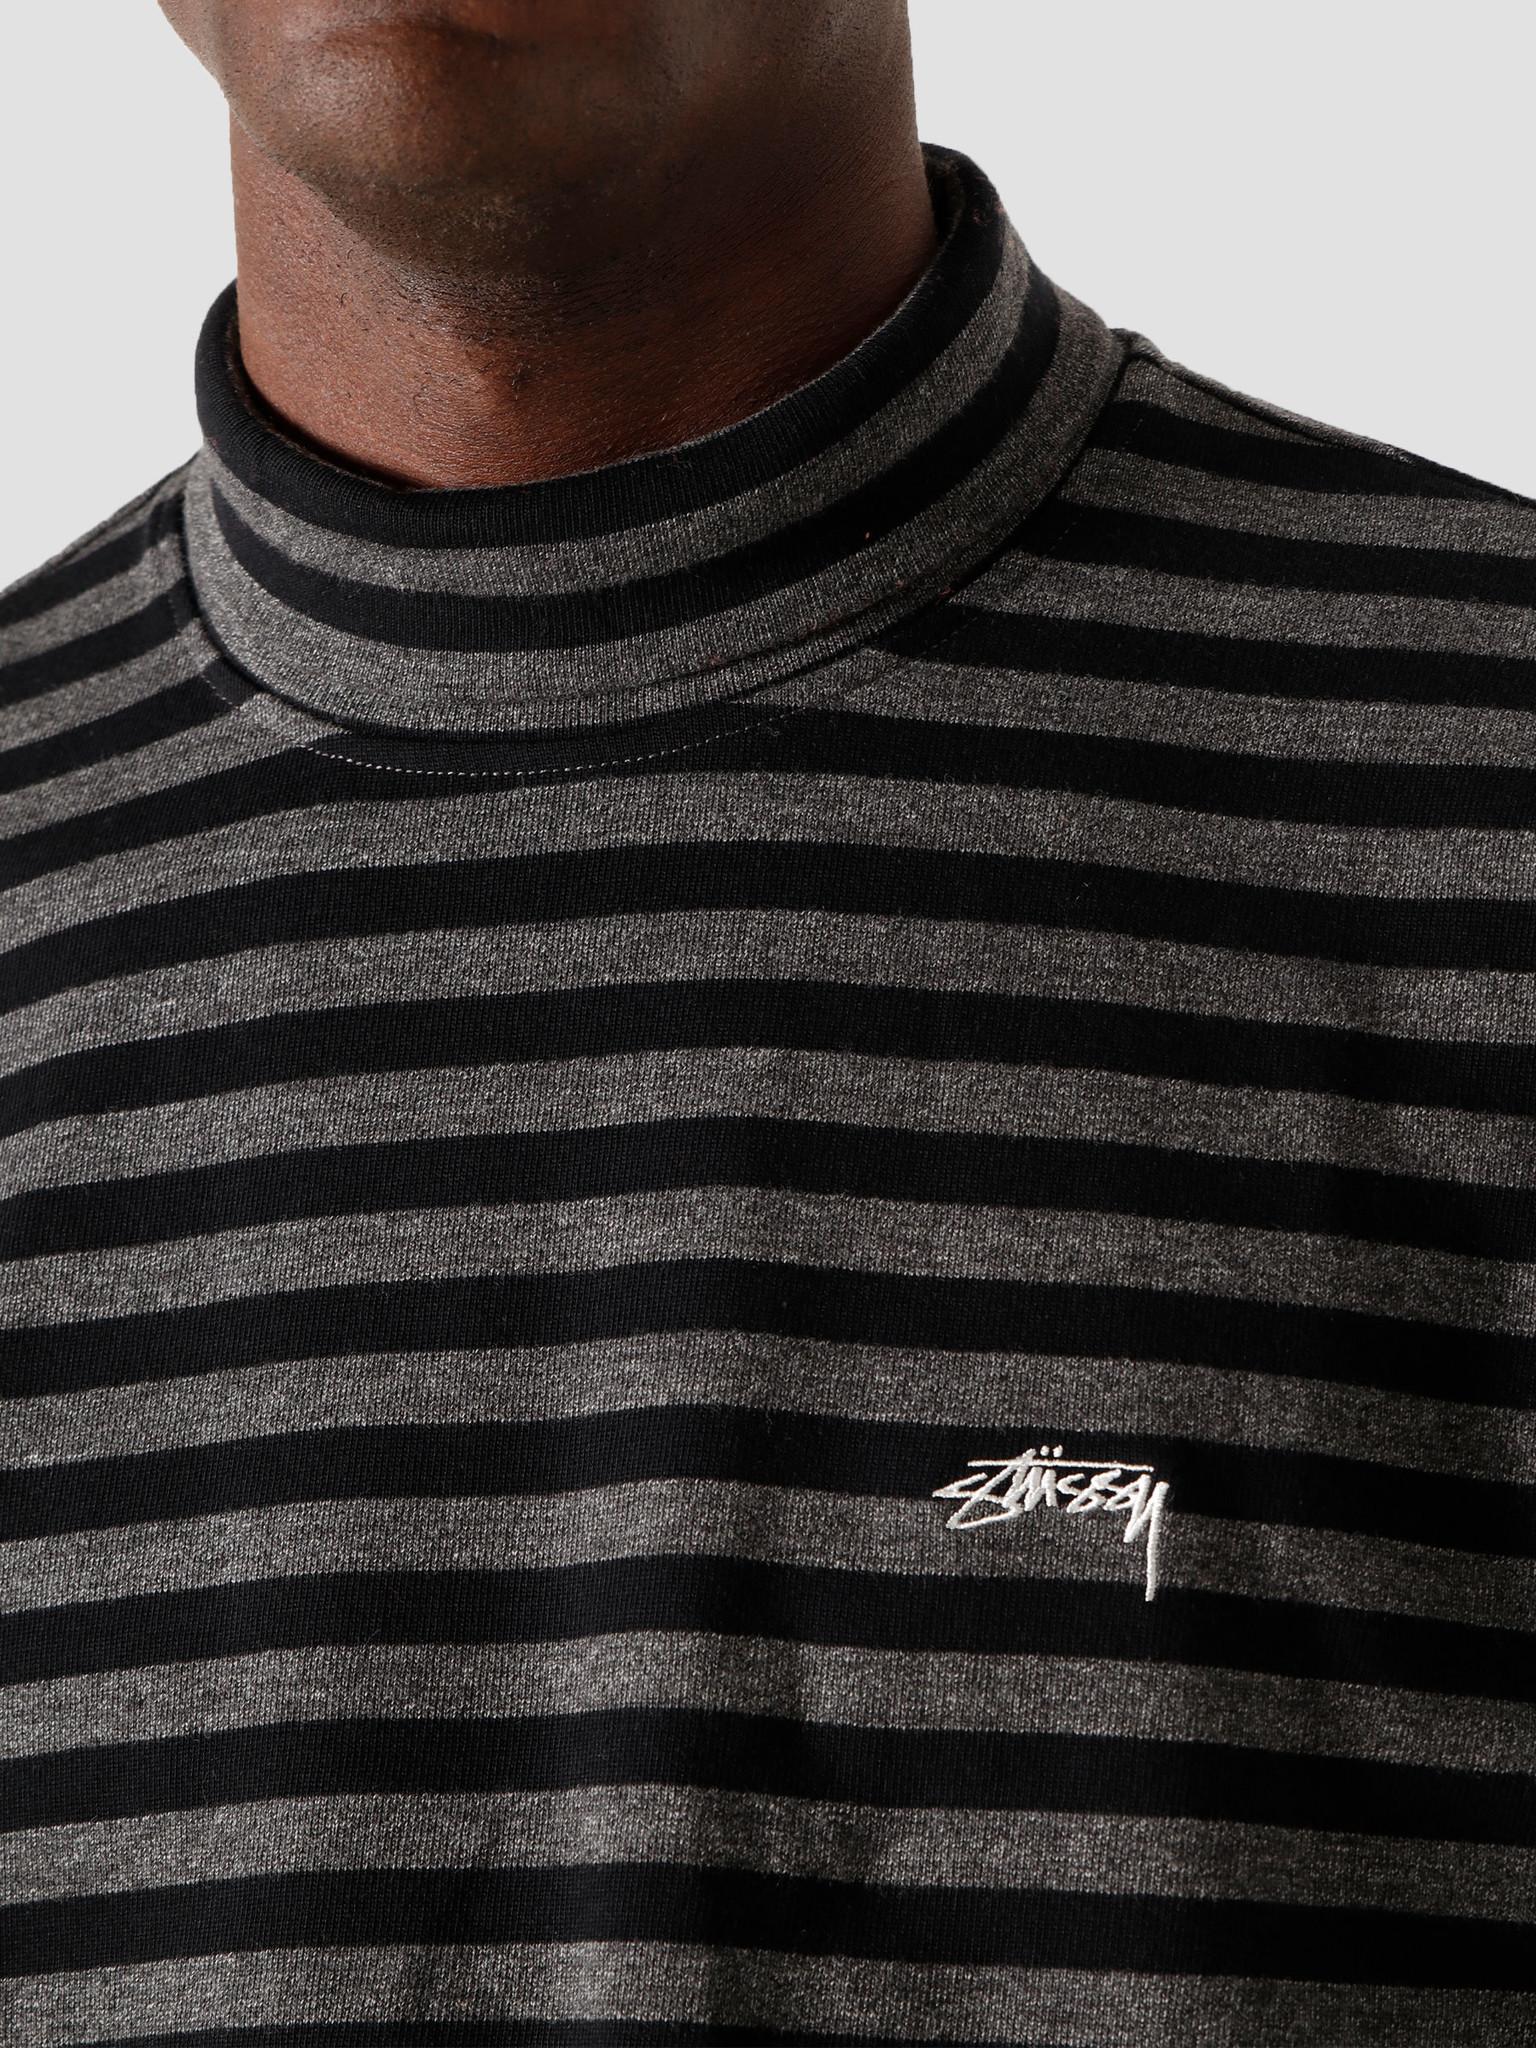 Stussy Stussy Classic Stripe Longsleeve Turtleneck Black 6105100010-0001